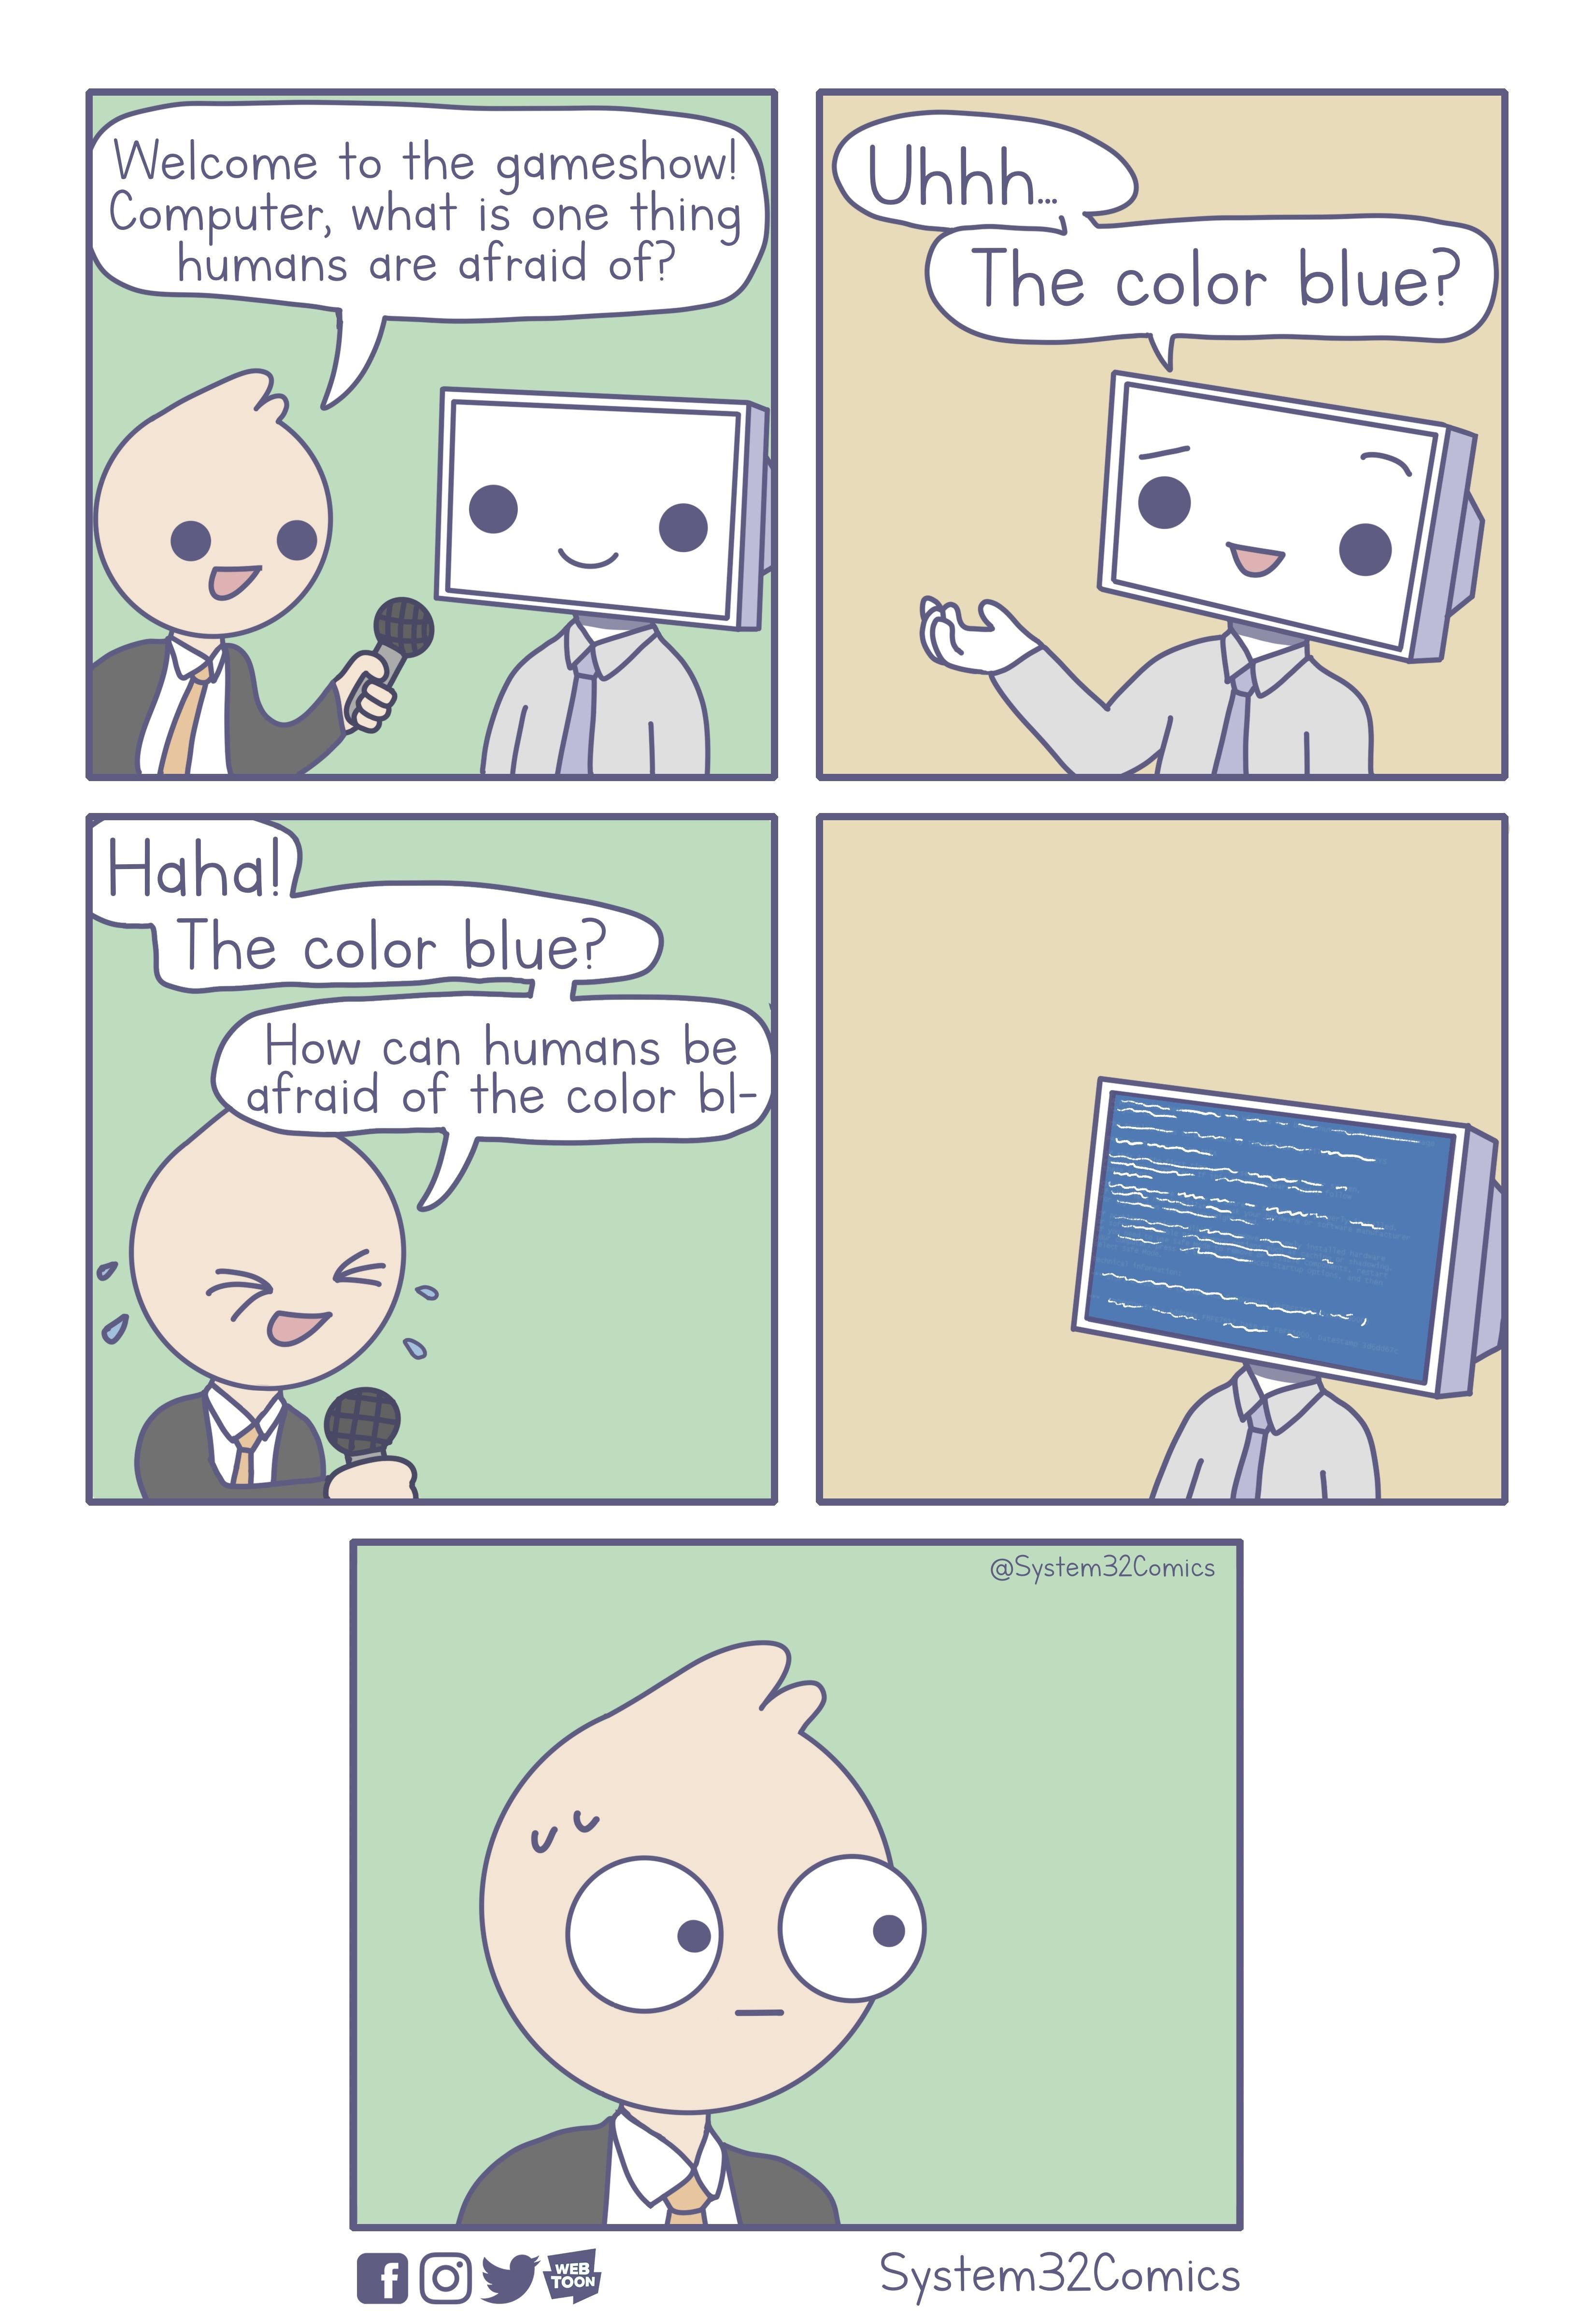 Computer Gameshow